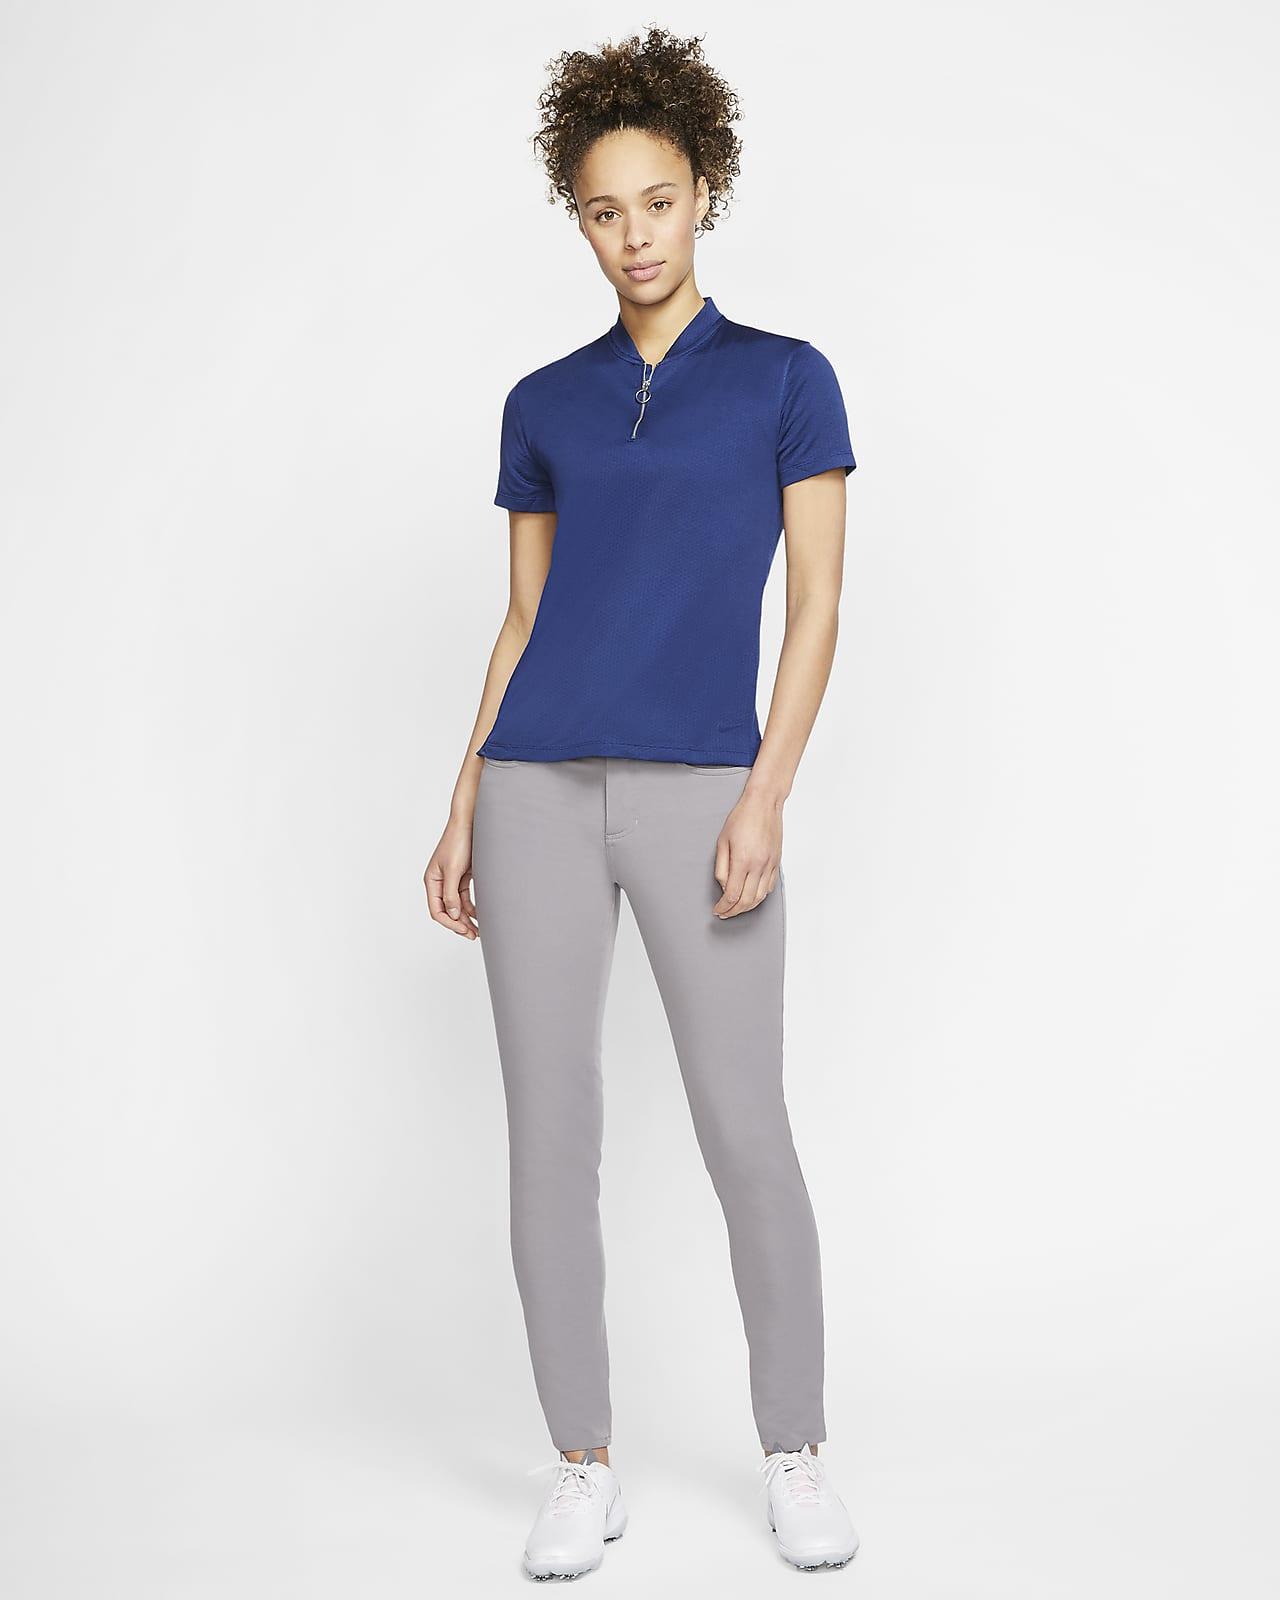 Nike Dri Fit Women S Golf Polo Nike Com Nike dri fit golf polo shirt sz xxl white gray. nike dri fit women s golf polo